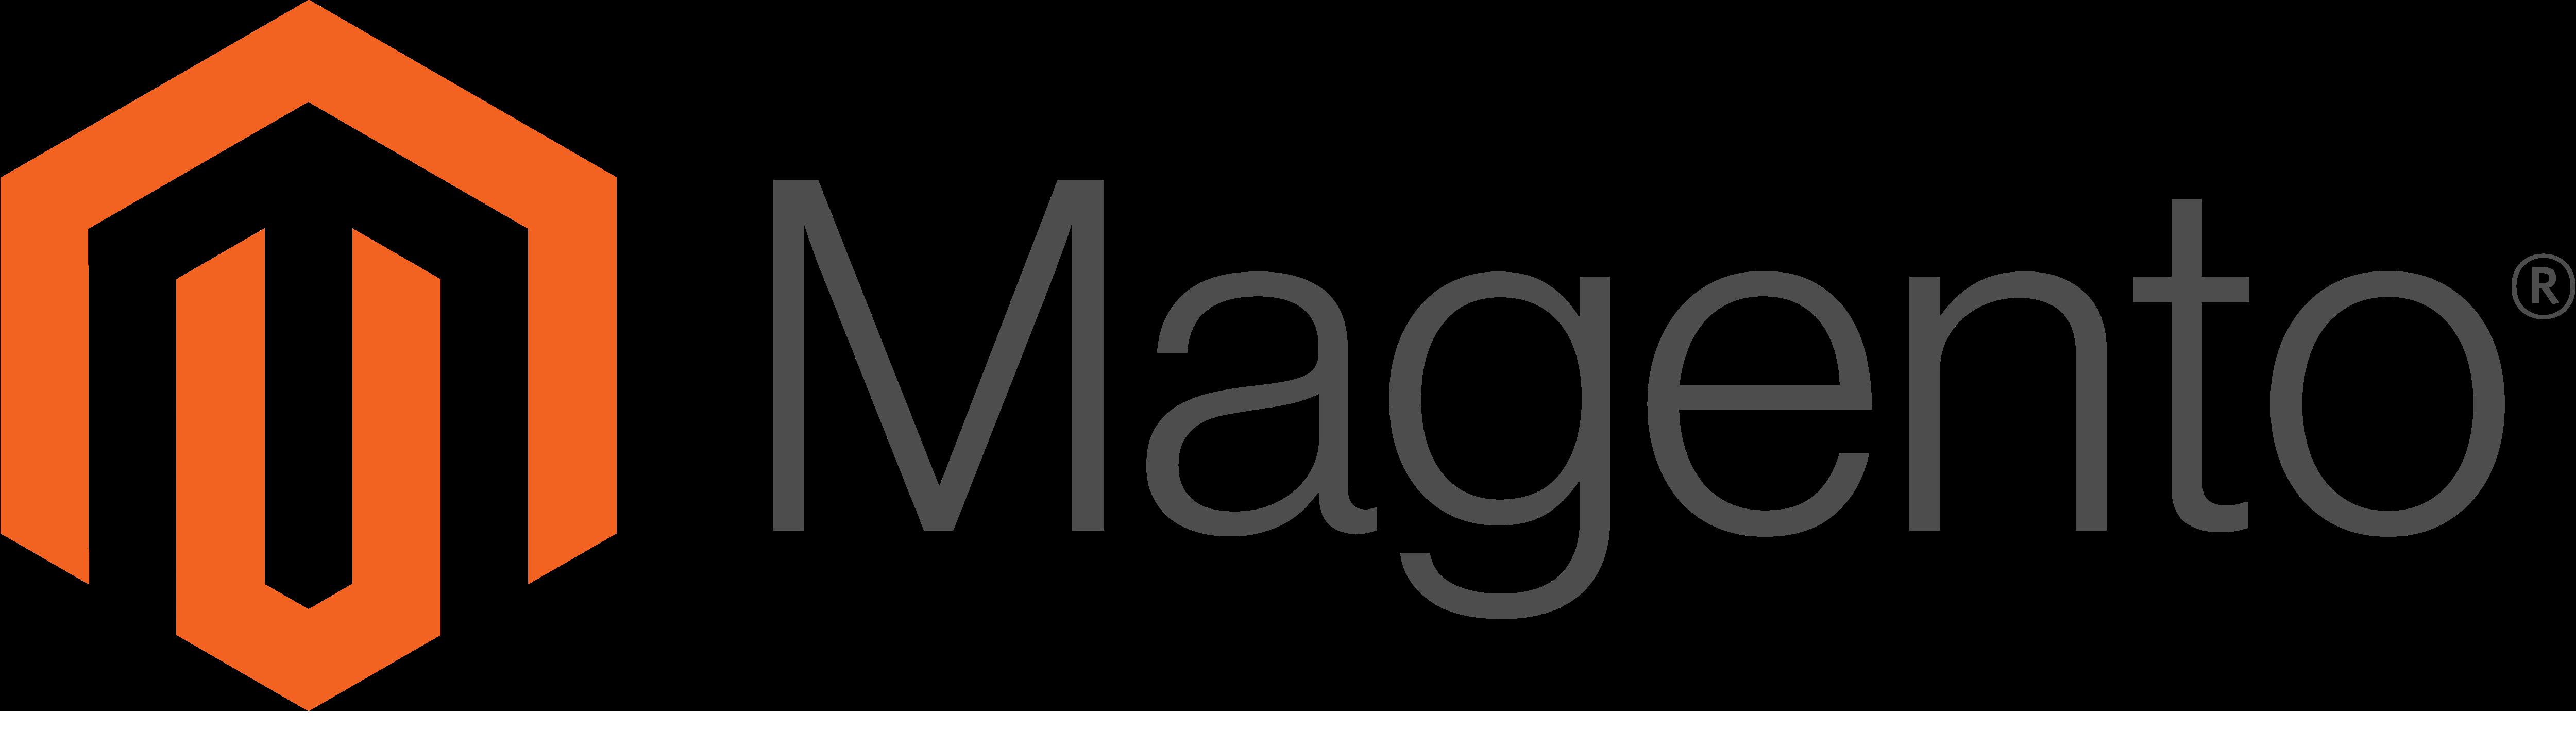 Magento Logos Download